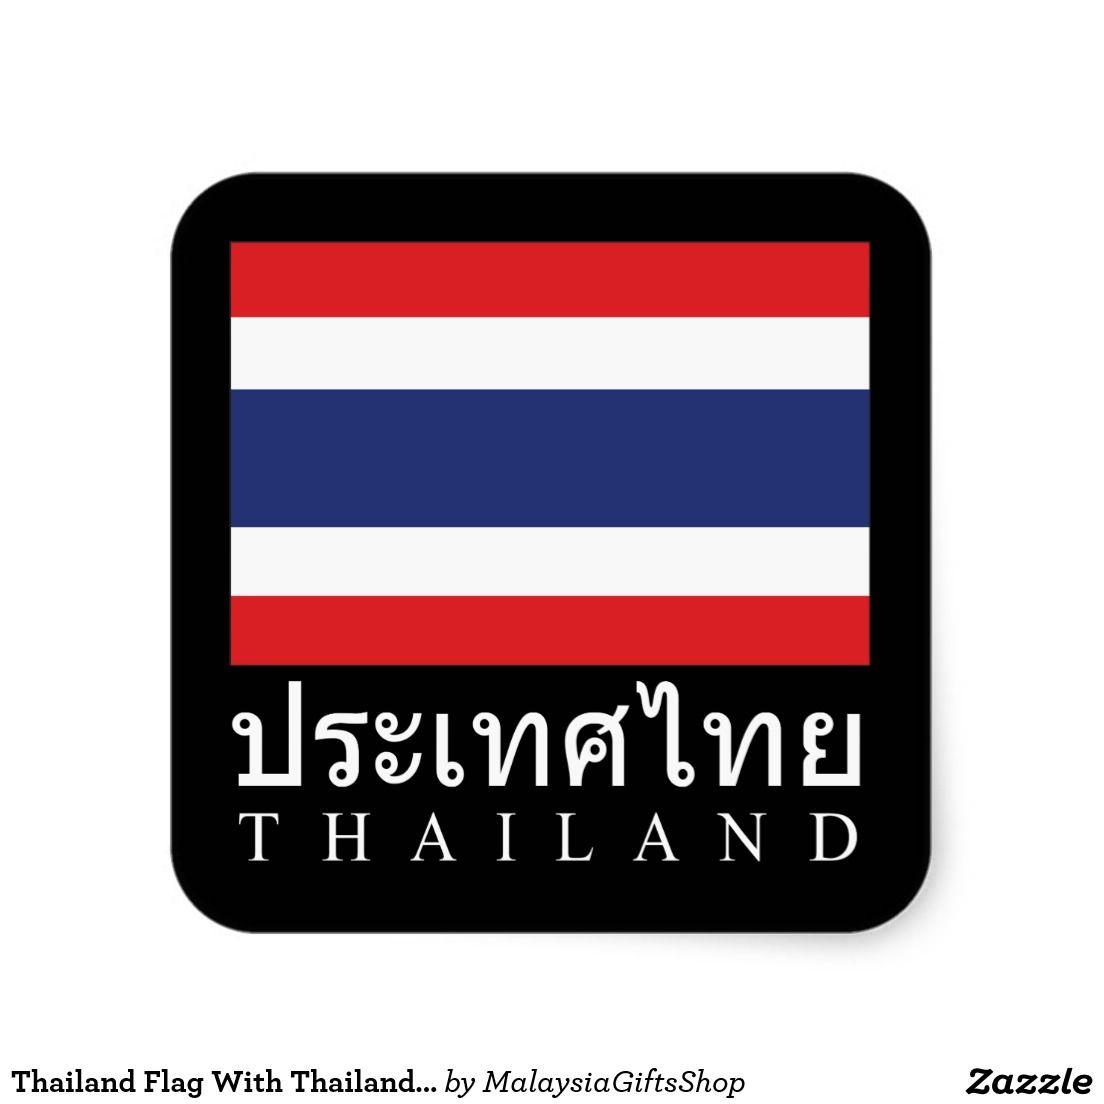 Thailand Flag With Thailand Word In Thai Language Square Sticker Zazzle Com In 2020 Thailand Flag Thai Language Learn Thai